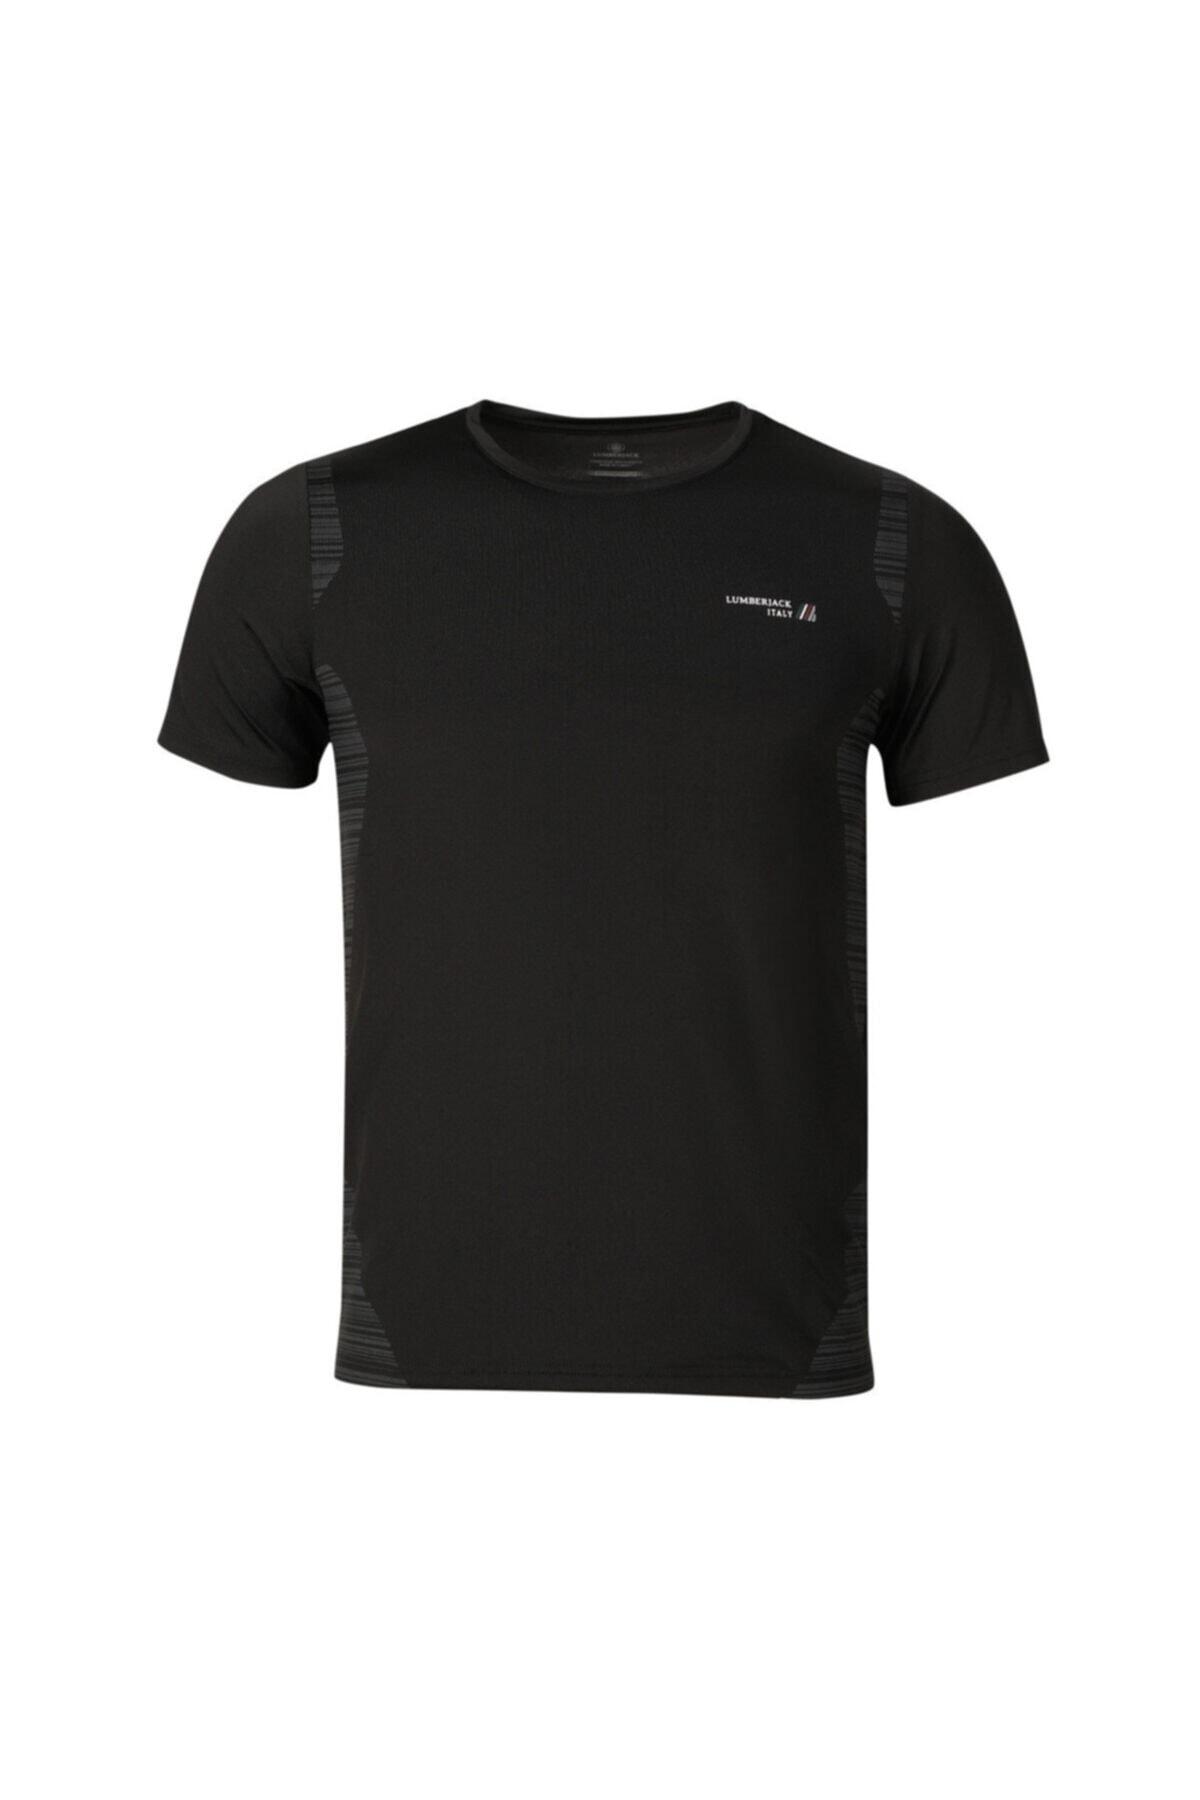 lumberjack CT452 DALE T-SHIRT Siyah Erkek T-Shirt 100582756 1